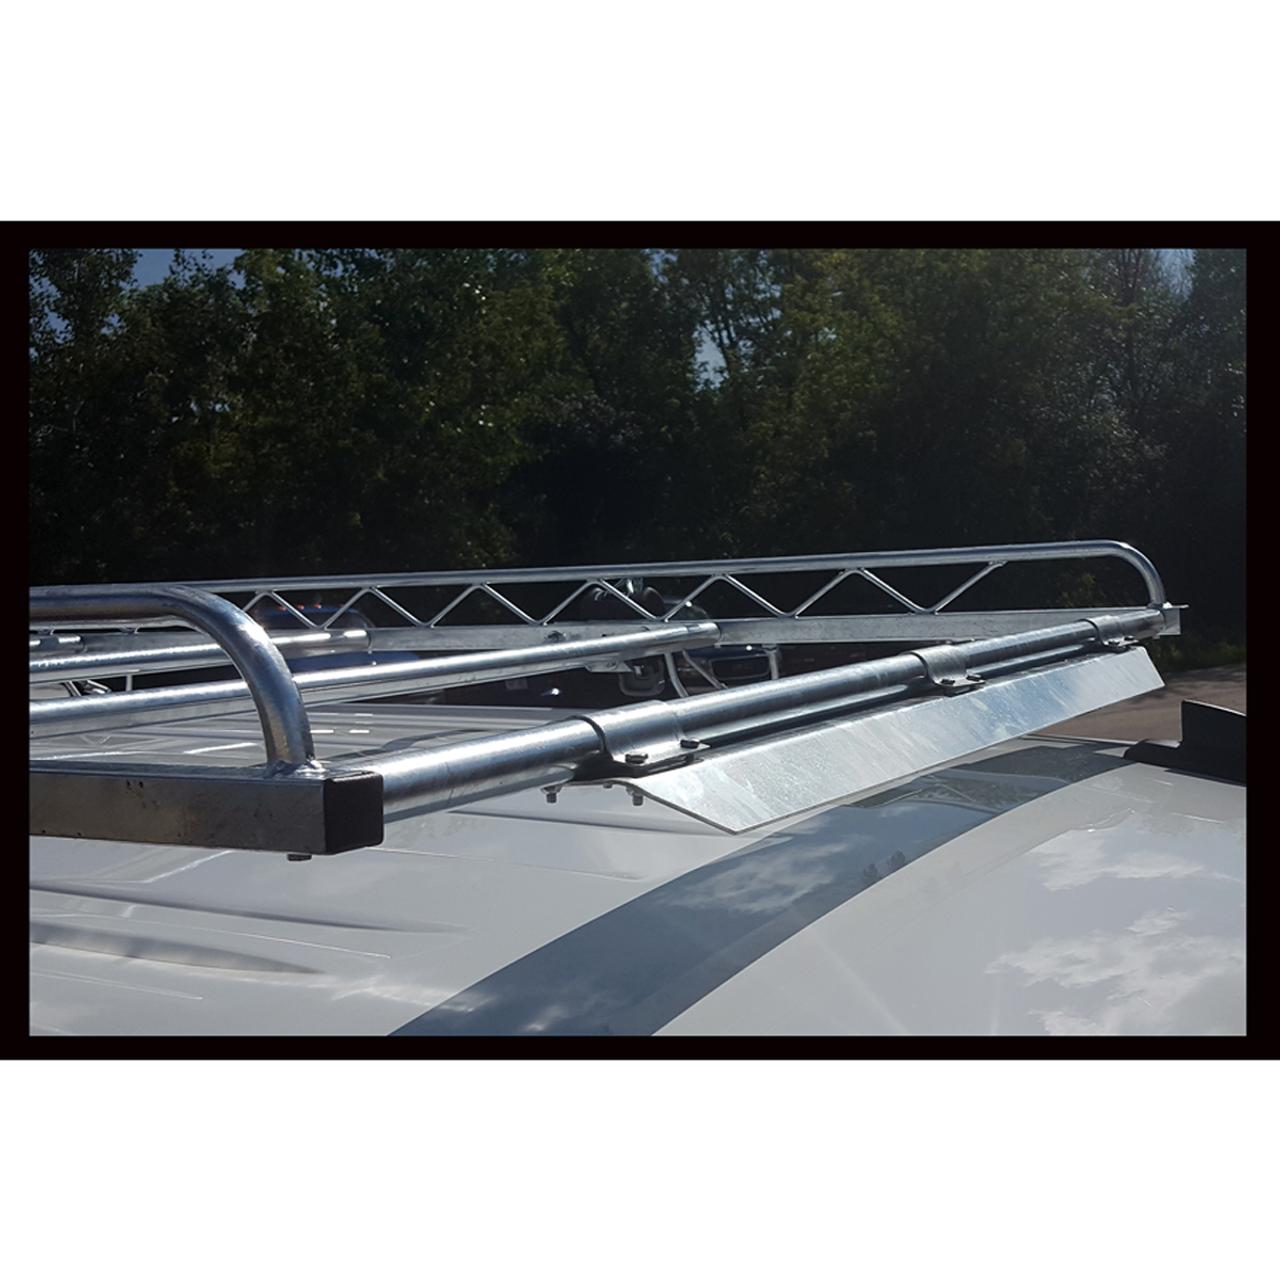 Topper 201040 Van Rack Accessory Wind Deflector Industrial Ladder Supply Co Inc